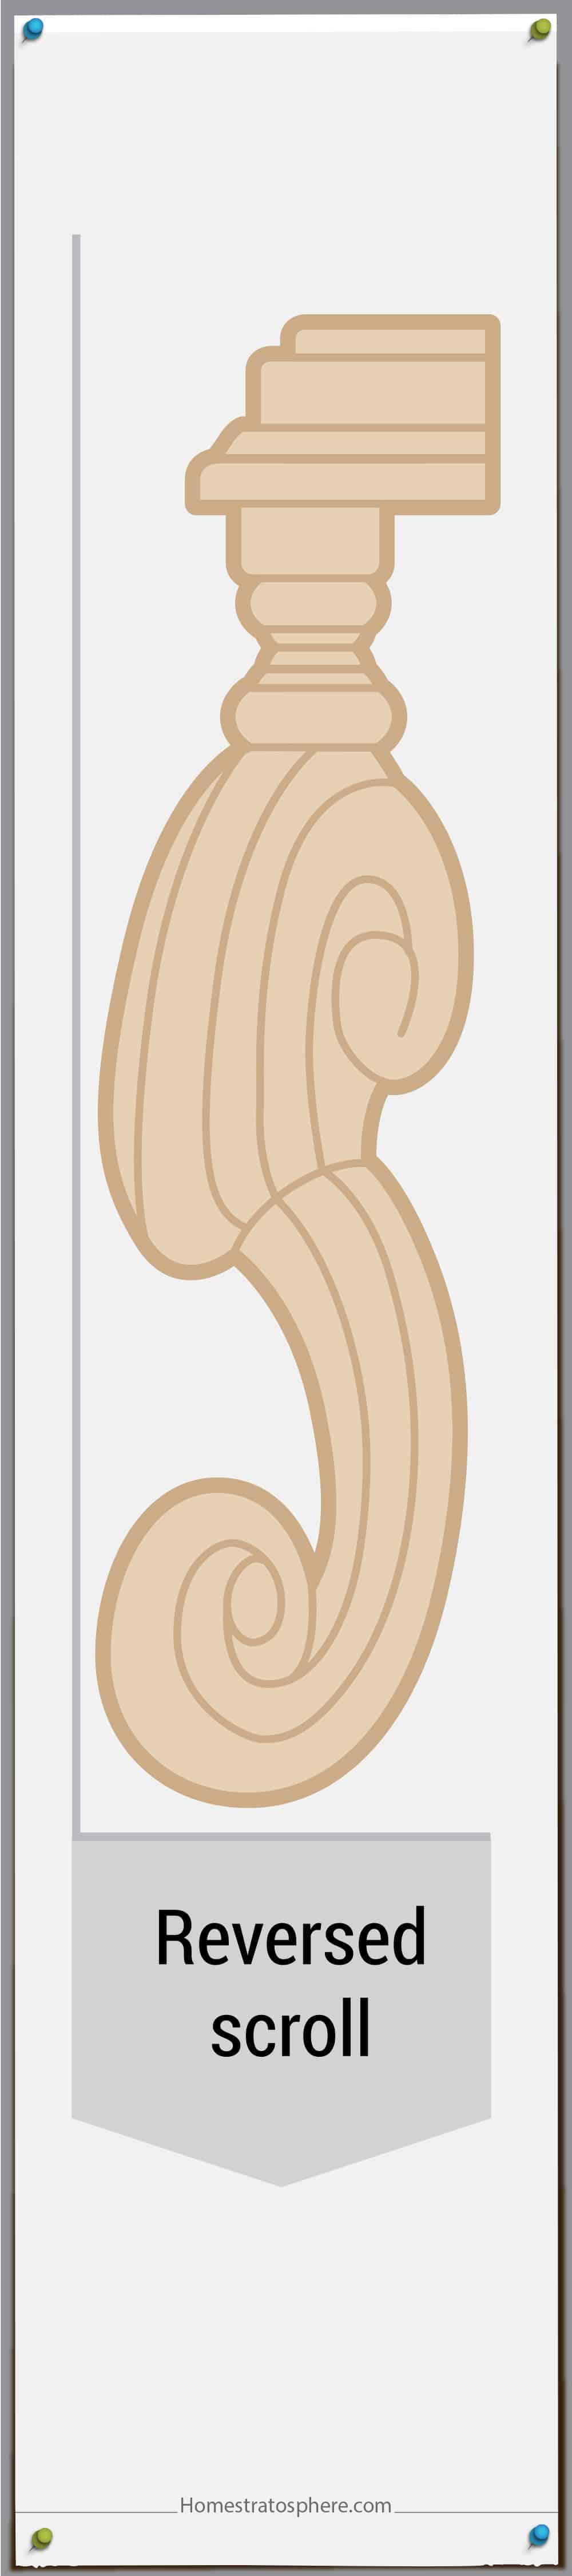 Reversed scroll furniture leg style